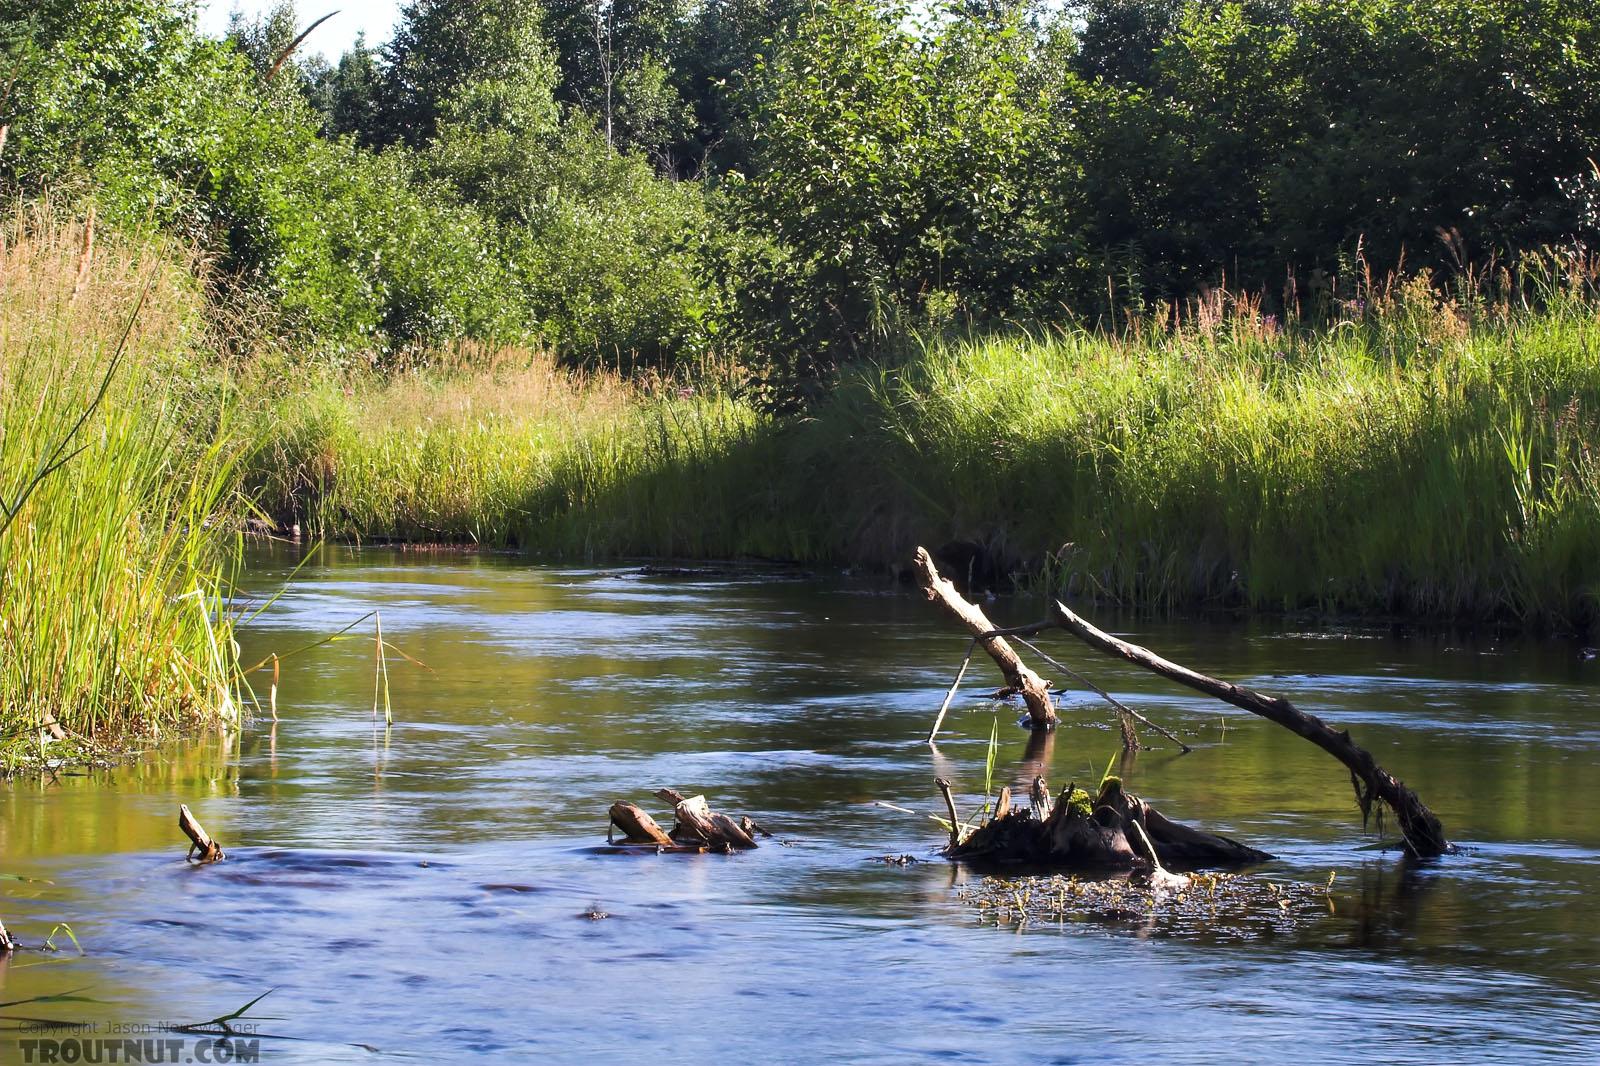 From Eighteenmile Creek in Wisconsin.